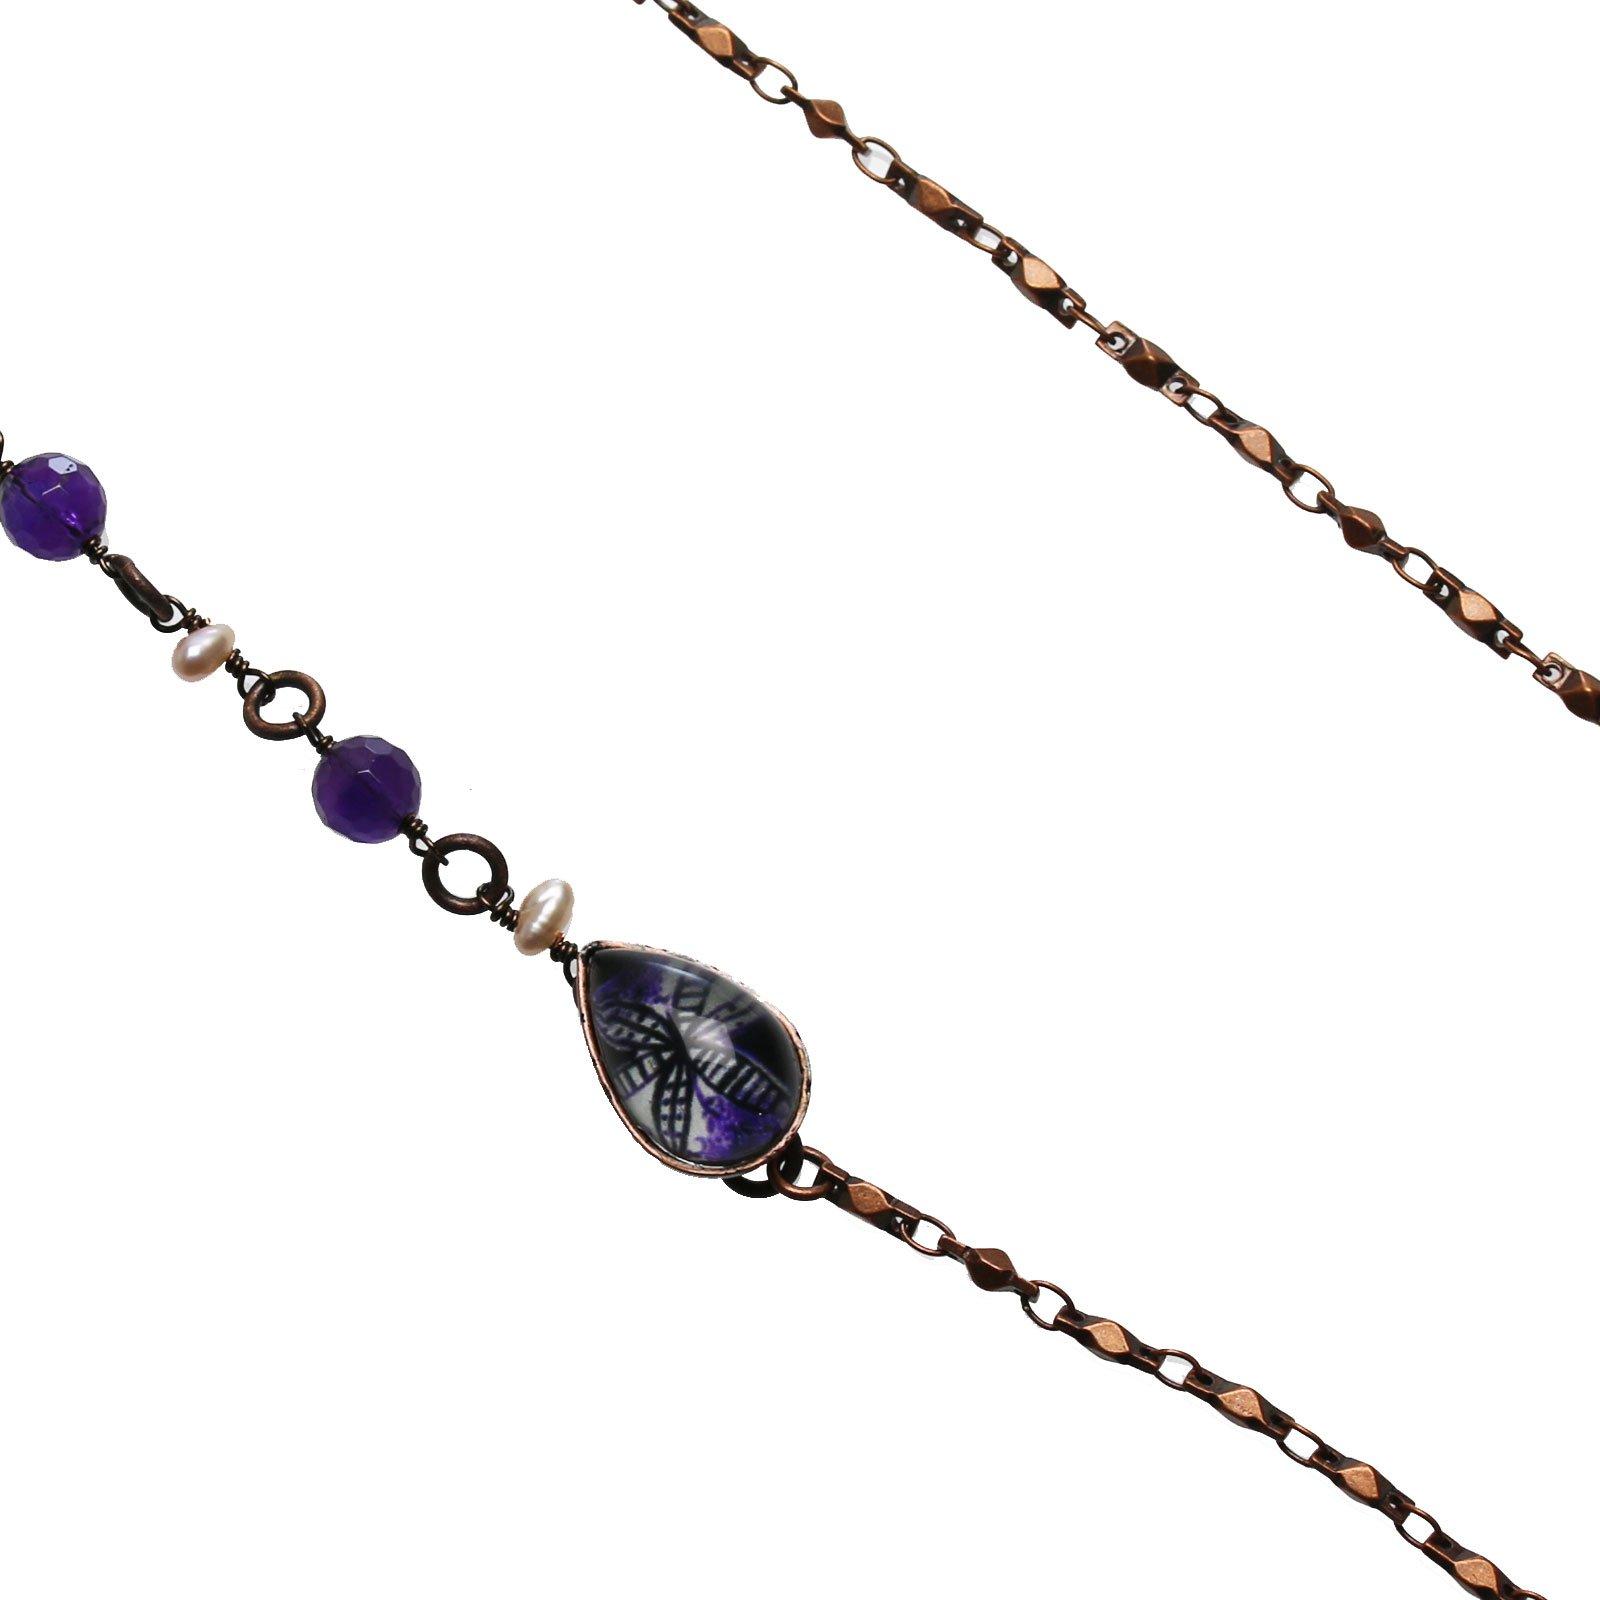 Tamarusan Eyeglass Chain Purple Lily Amethyst Freshwater Pearl Antique Style Eyeglasses Holder by TAMARUSAN